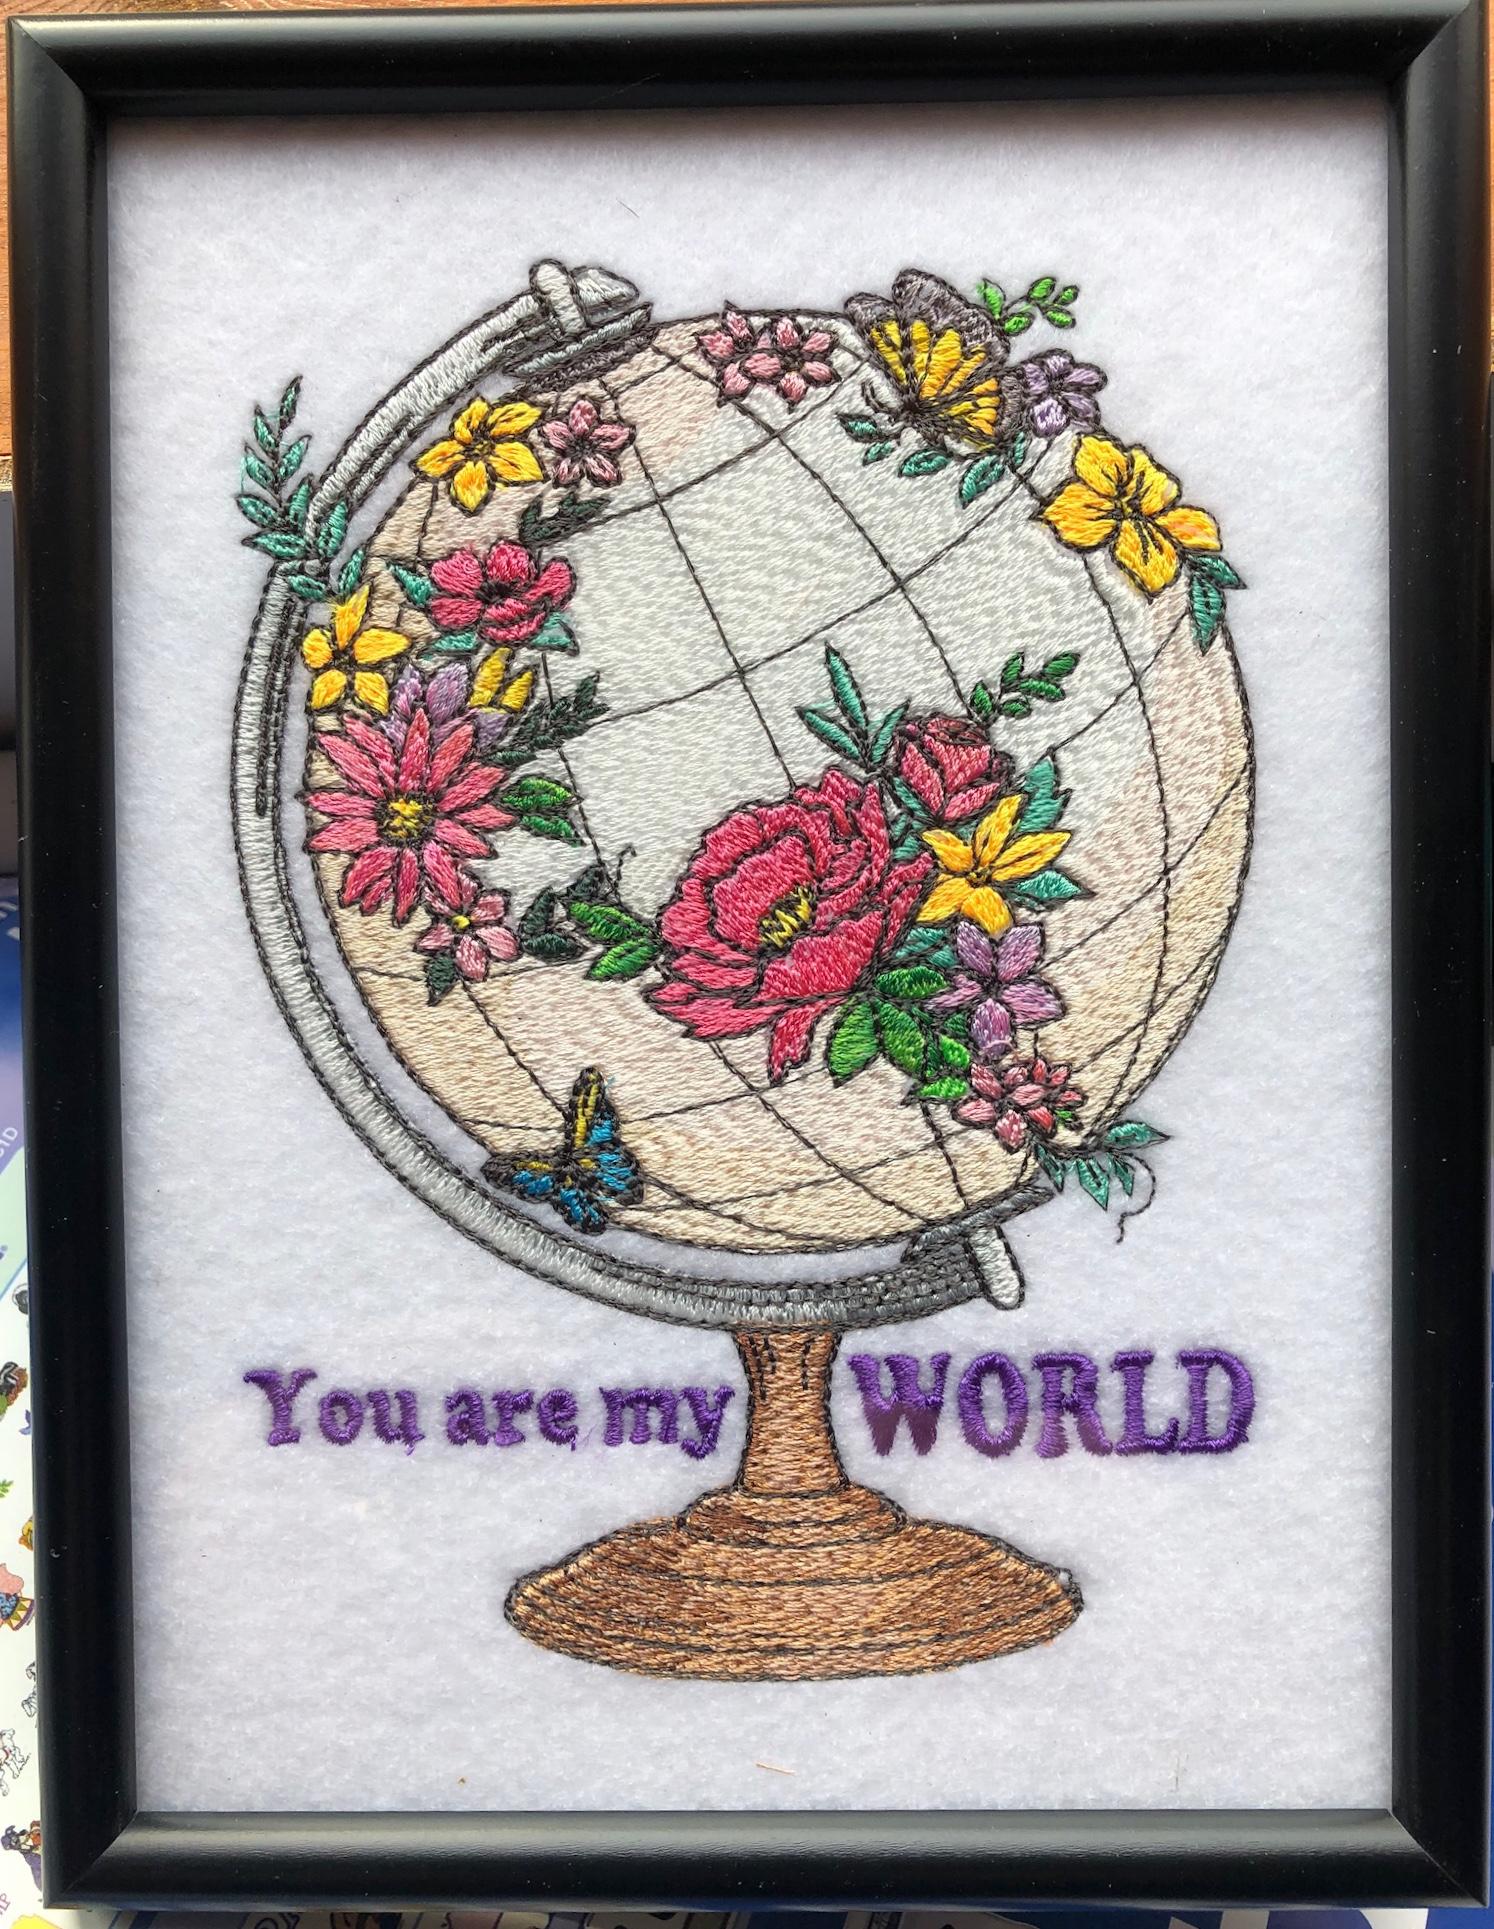 Embroidery/F75D9B0E-A8E0-4CF2-A924-A9B680886E35.jpeg